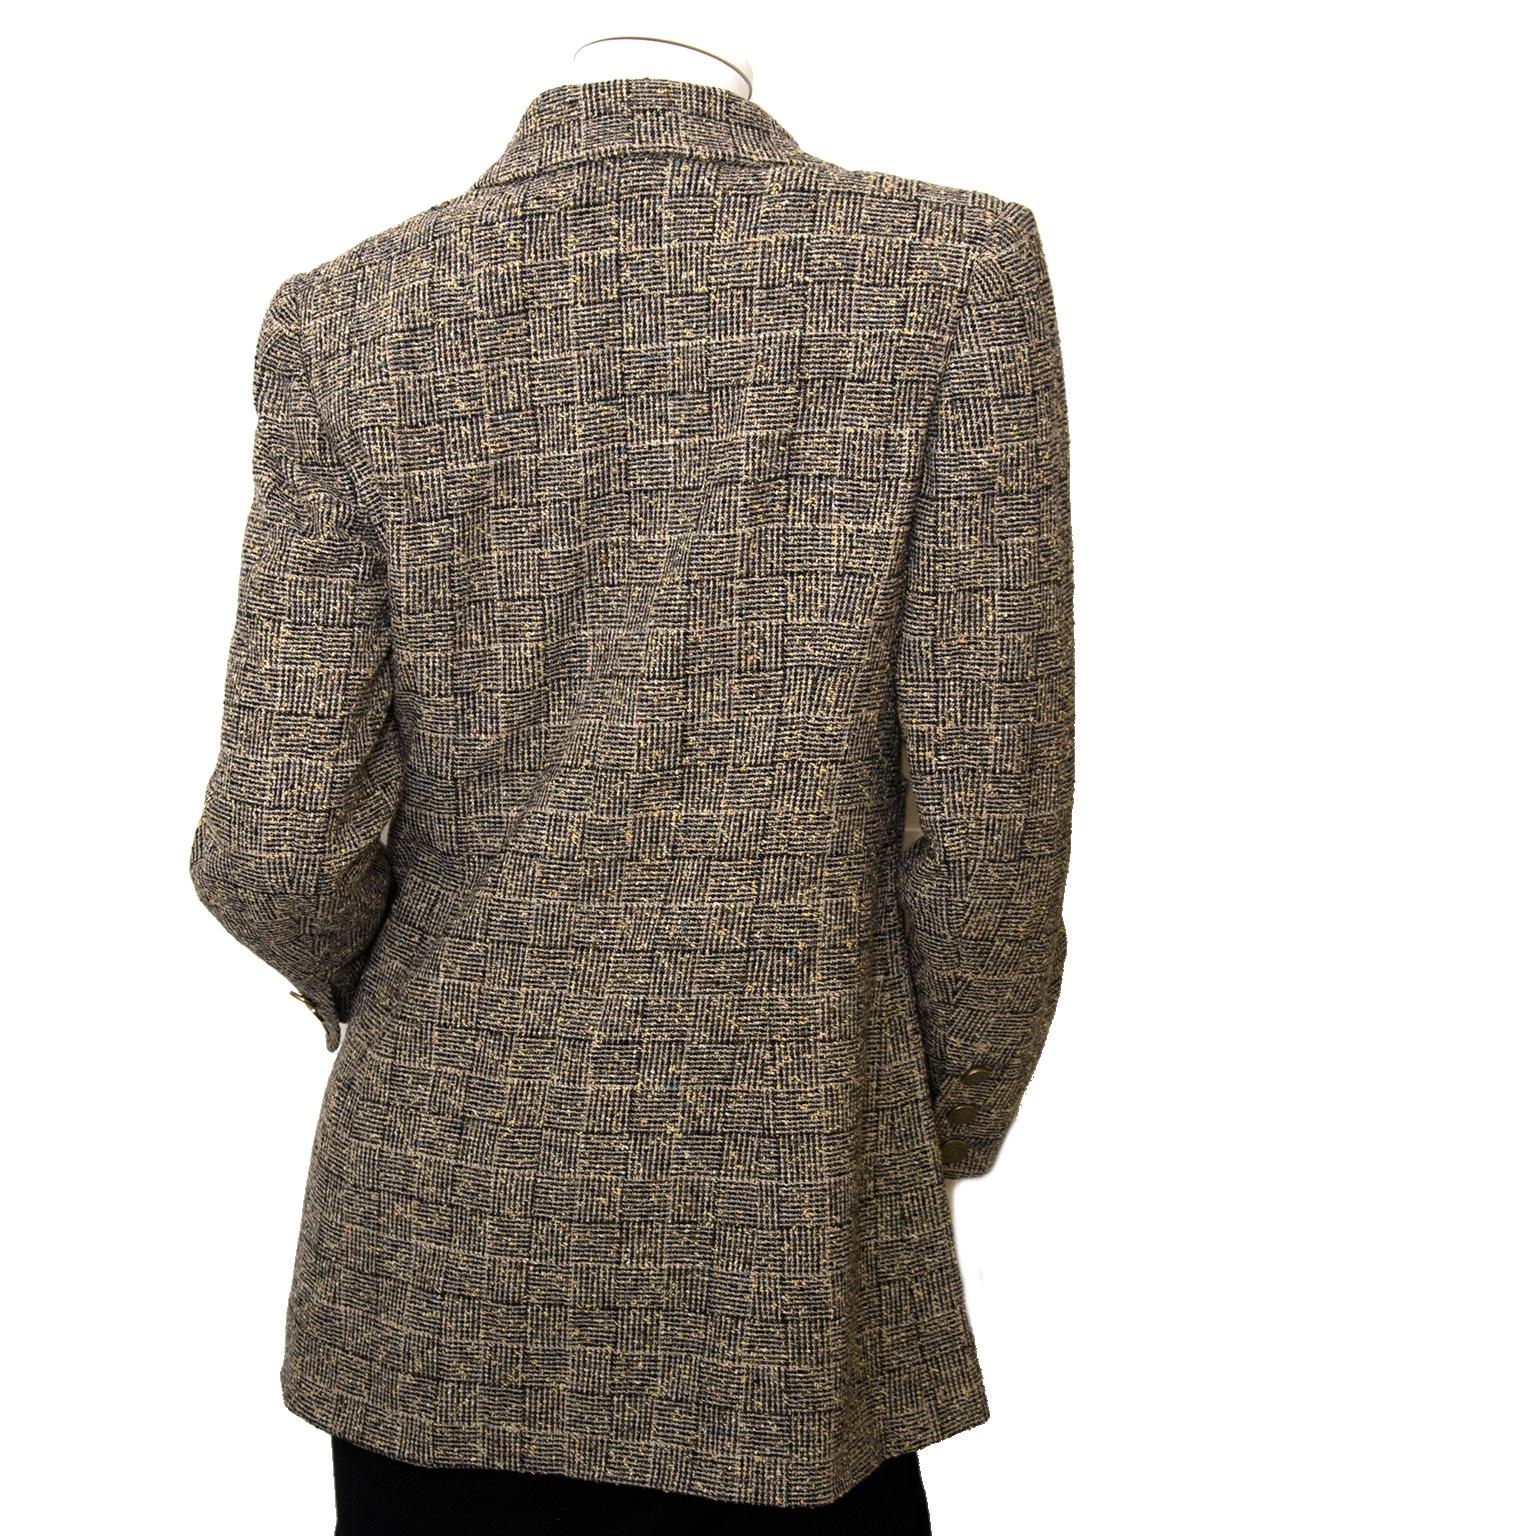 chanel tweed blazer now for sale at labellov vintage fashion webshop belgium